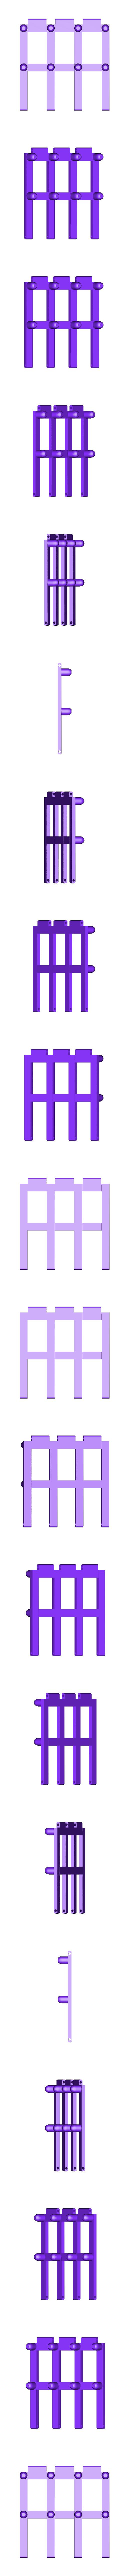 Romulan_belt_x9.stl Download free STL file Romulan Harness • 3D print template, poblocki1982